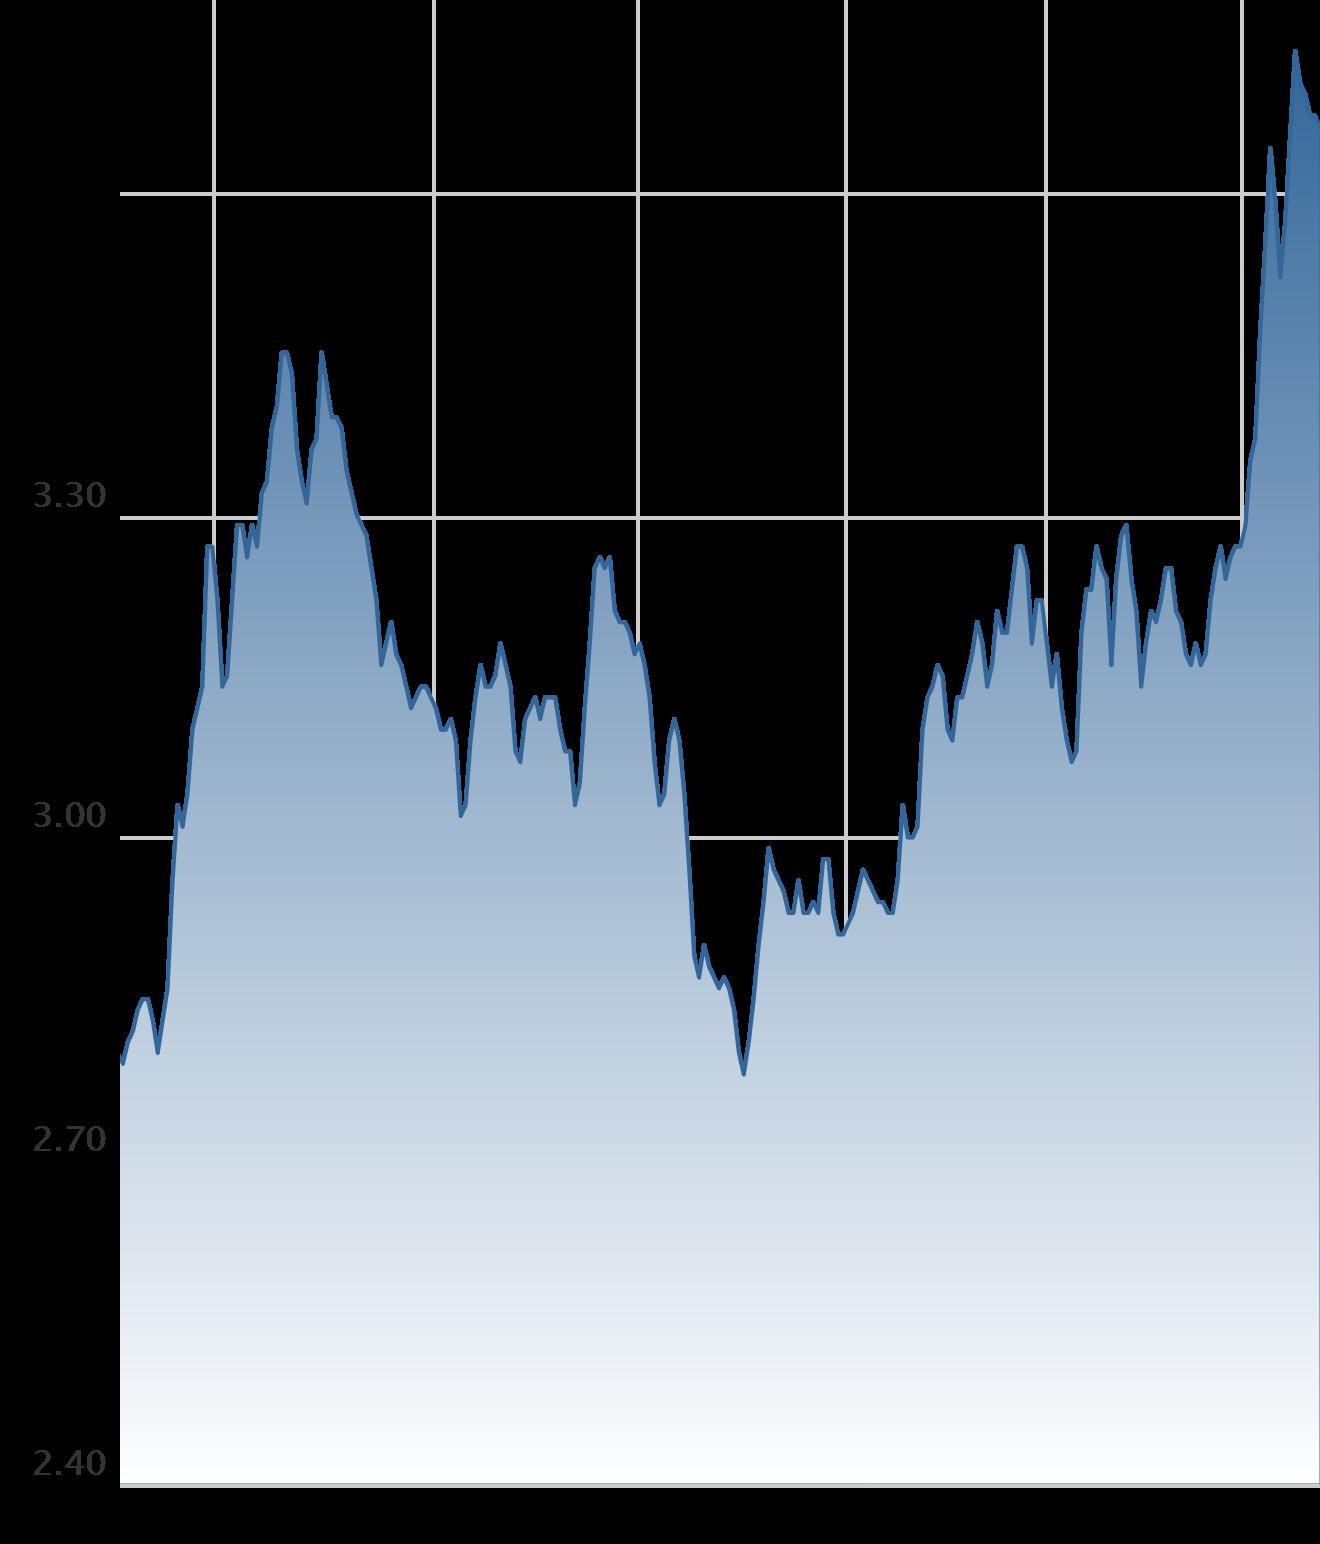 http://widgets.mortgagenewsdaily.com/Chart/MortgageRates?p=30YRFRM&w=330&h=386&t=000000&bg=FFFFFF&fc=336699